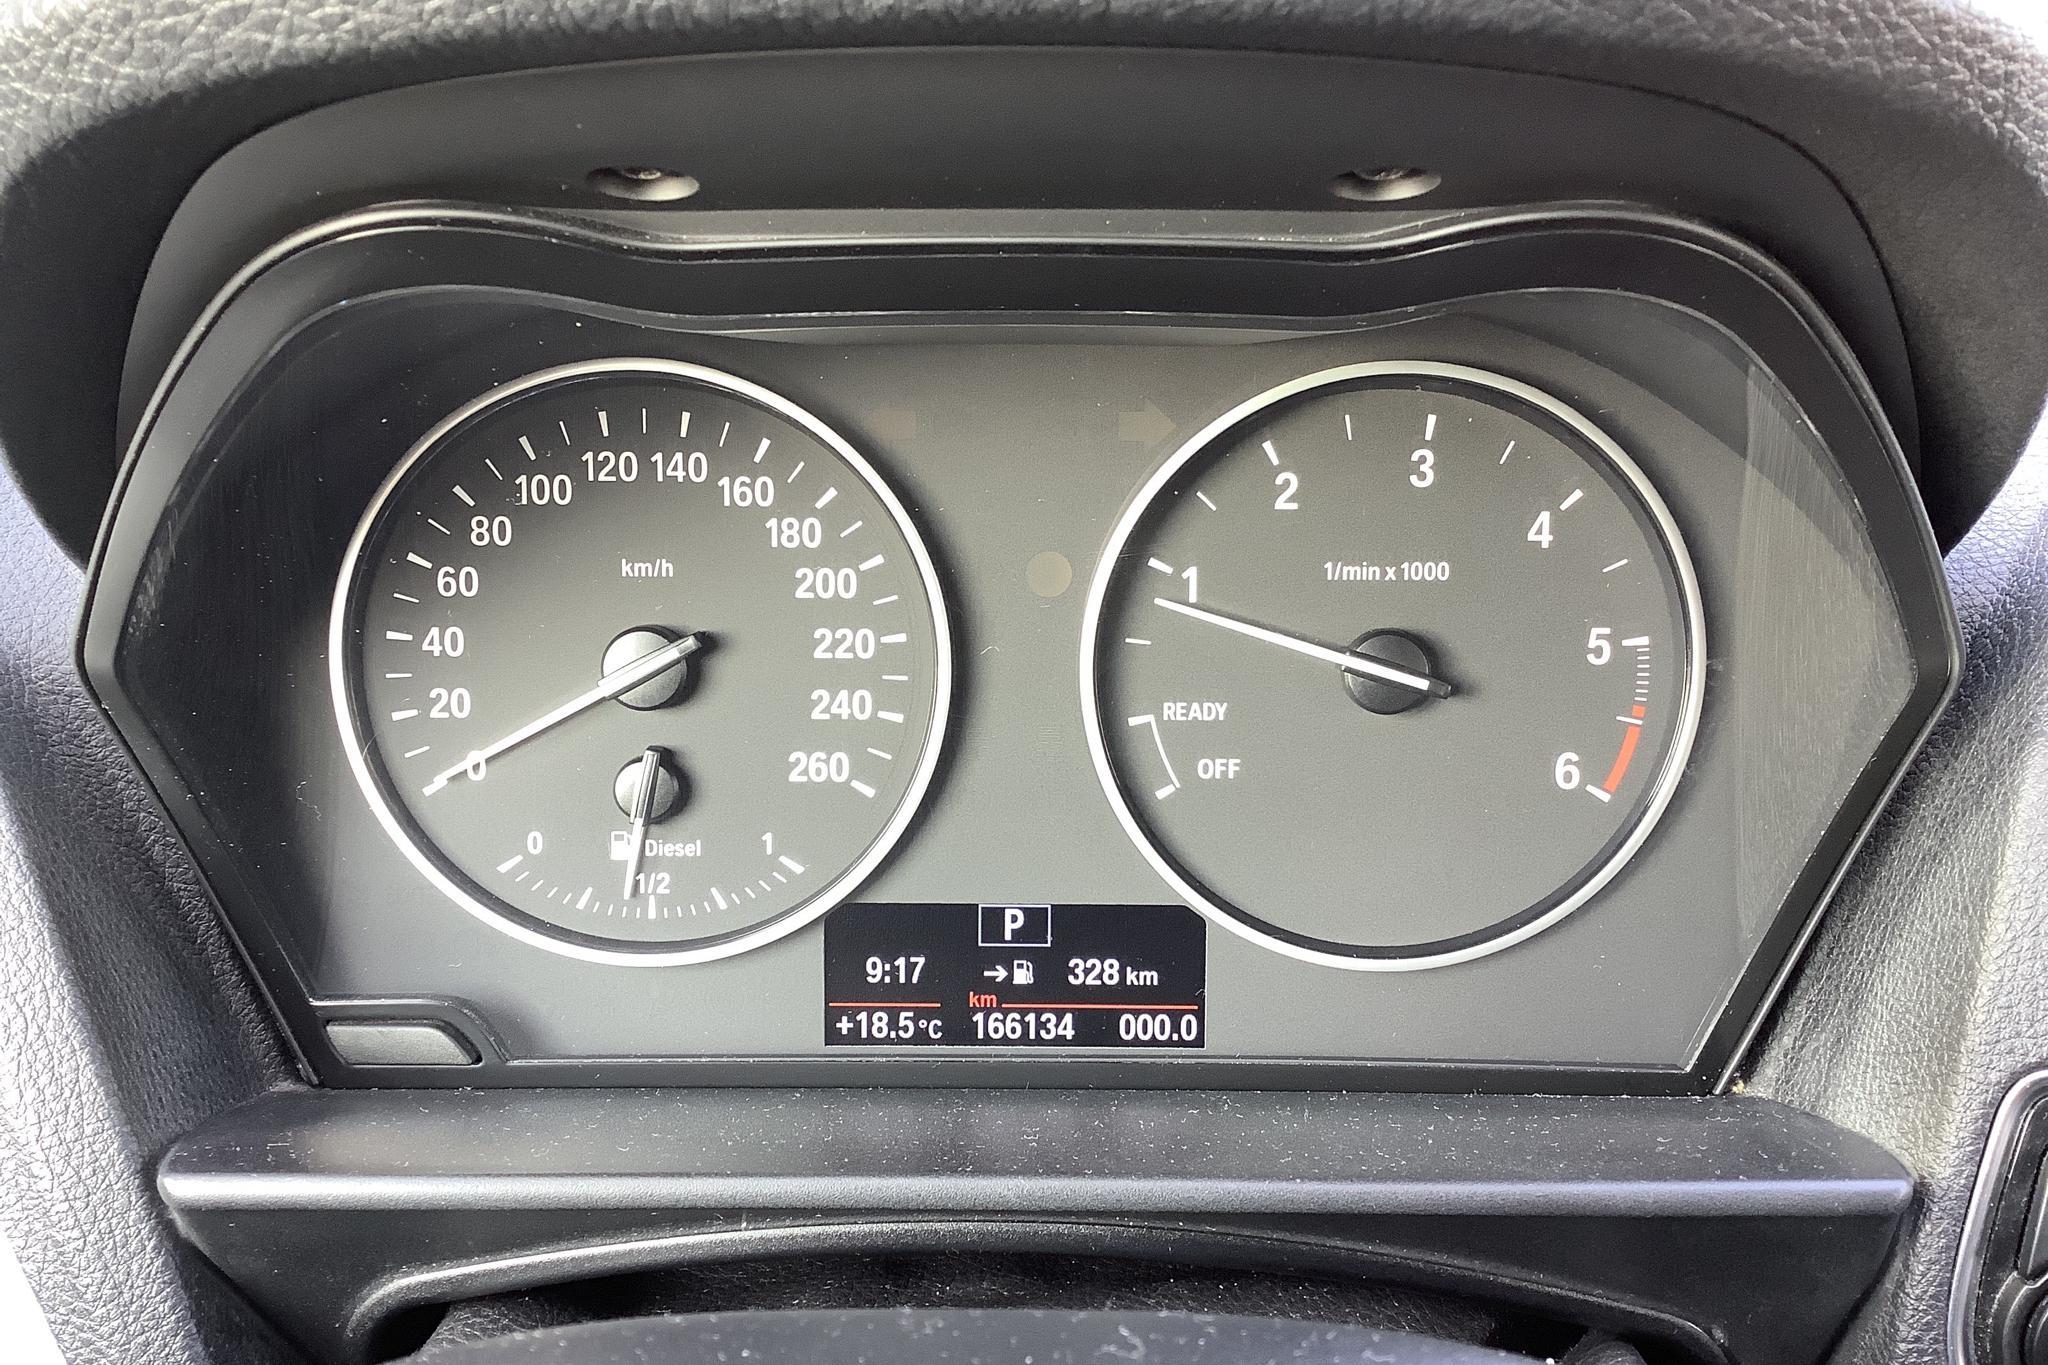 BMW 118d 5dr, F20 (143hk) - 16 614 mil - Automat - svart - 2012